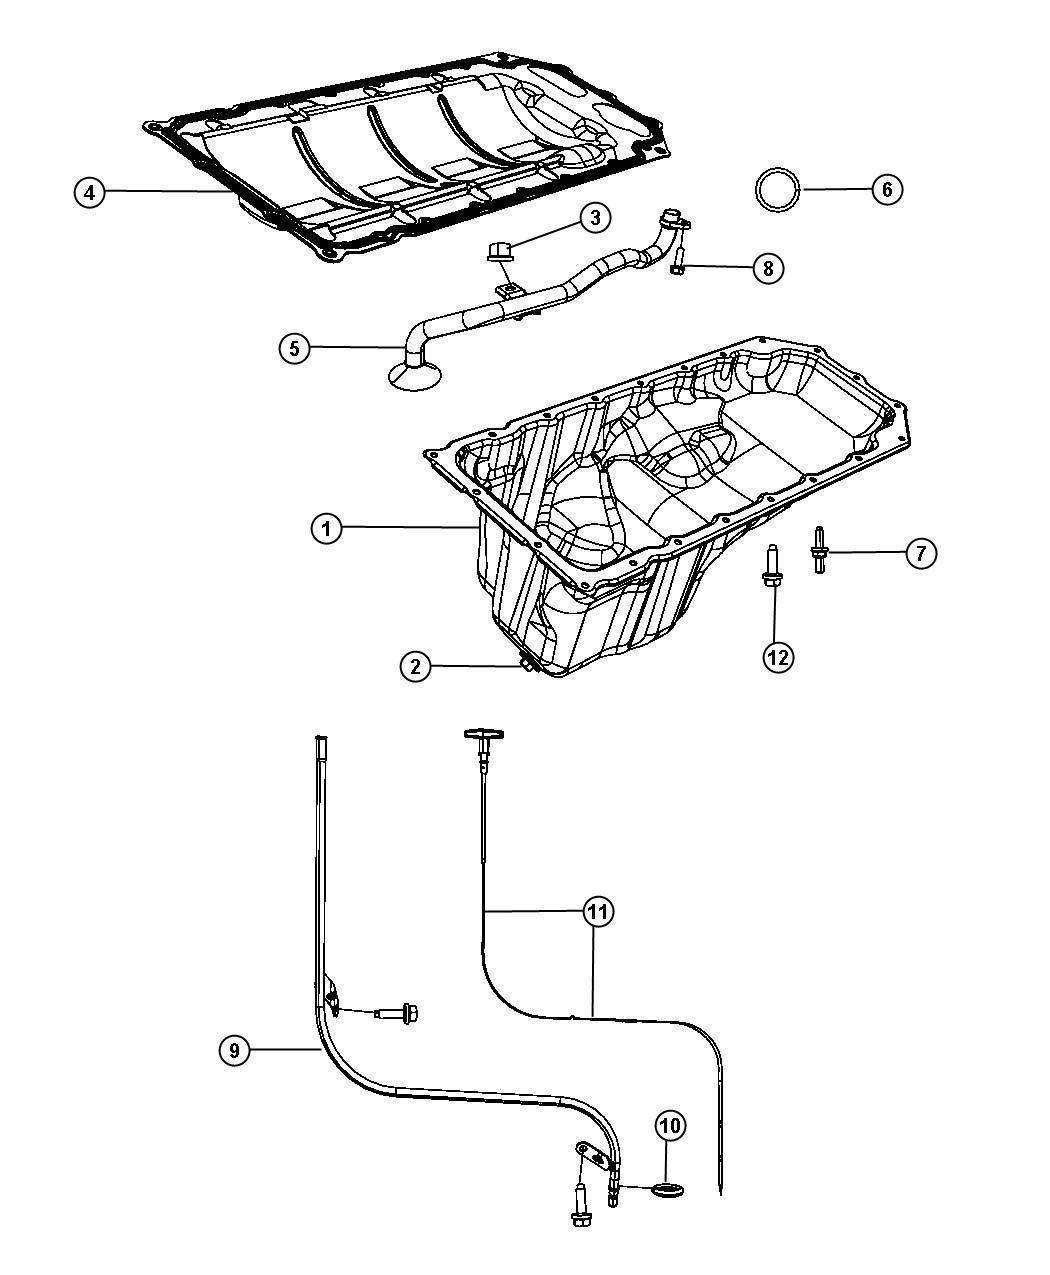 Gx 9206  08 Dodge Caliber 2 0 Engine Diagram Wiring Diagram